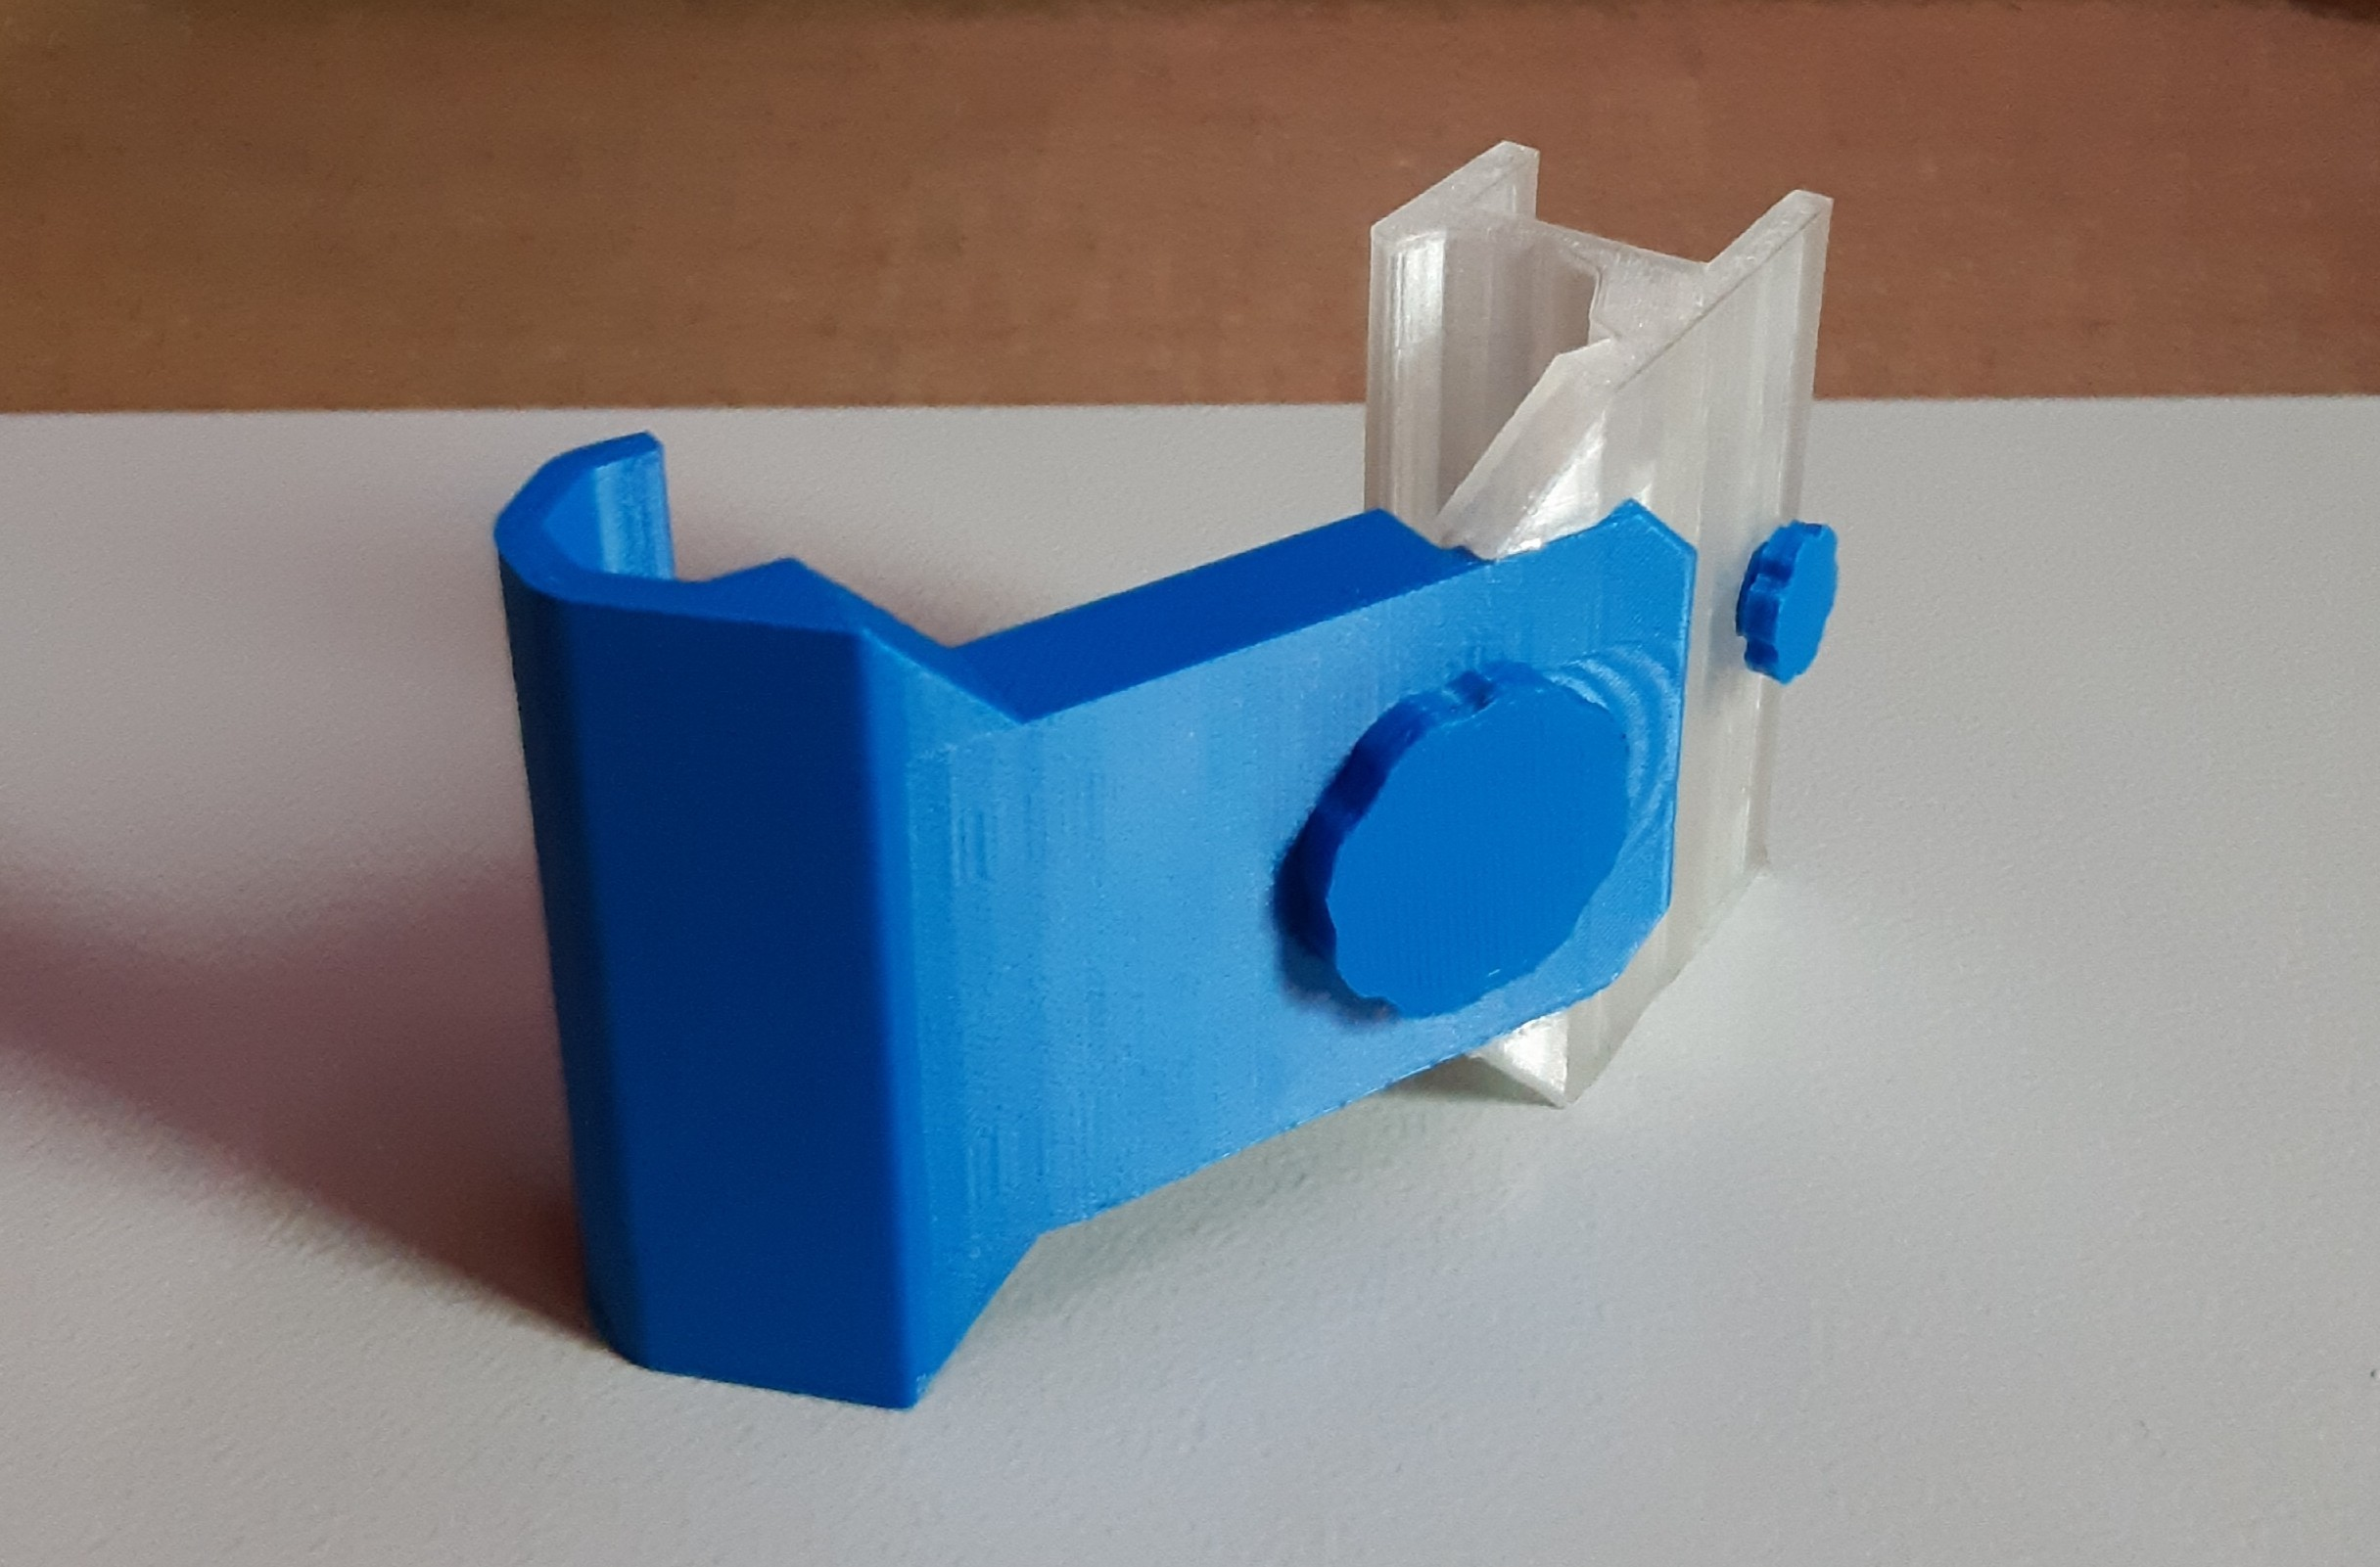 PhoneNextTo_iguigui_01.jpg Download free STL file Phone Next To • 3D print model, iguigui